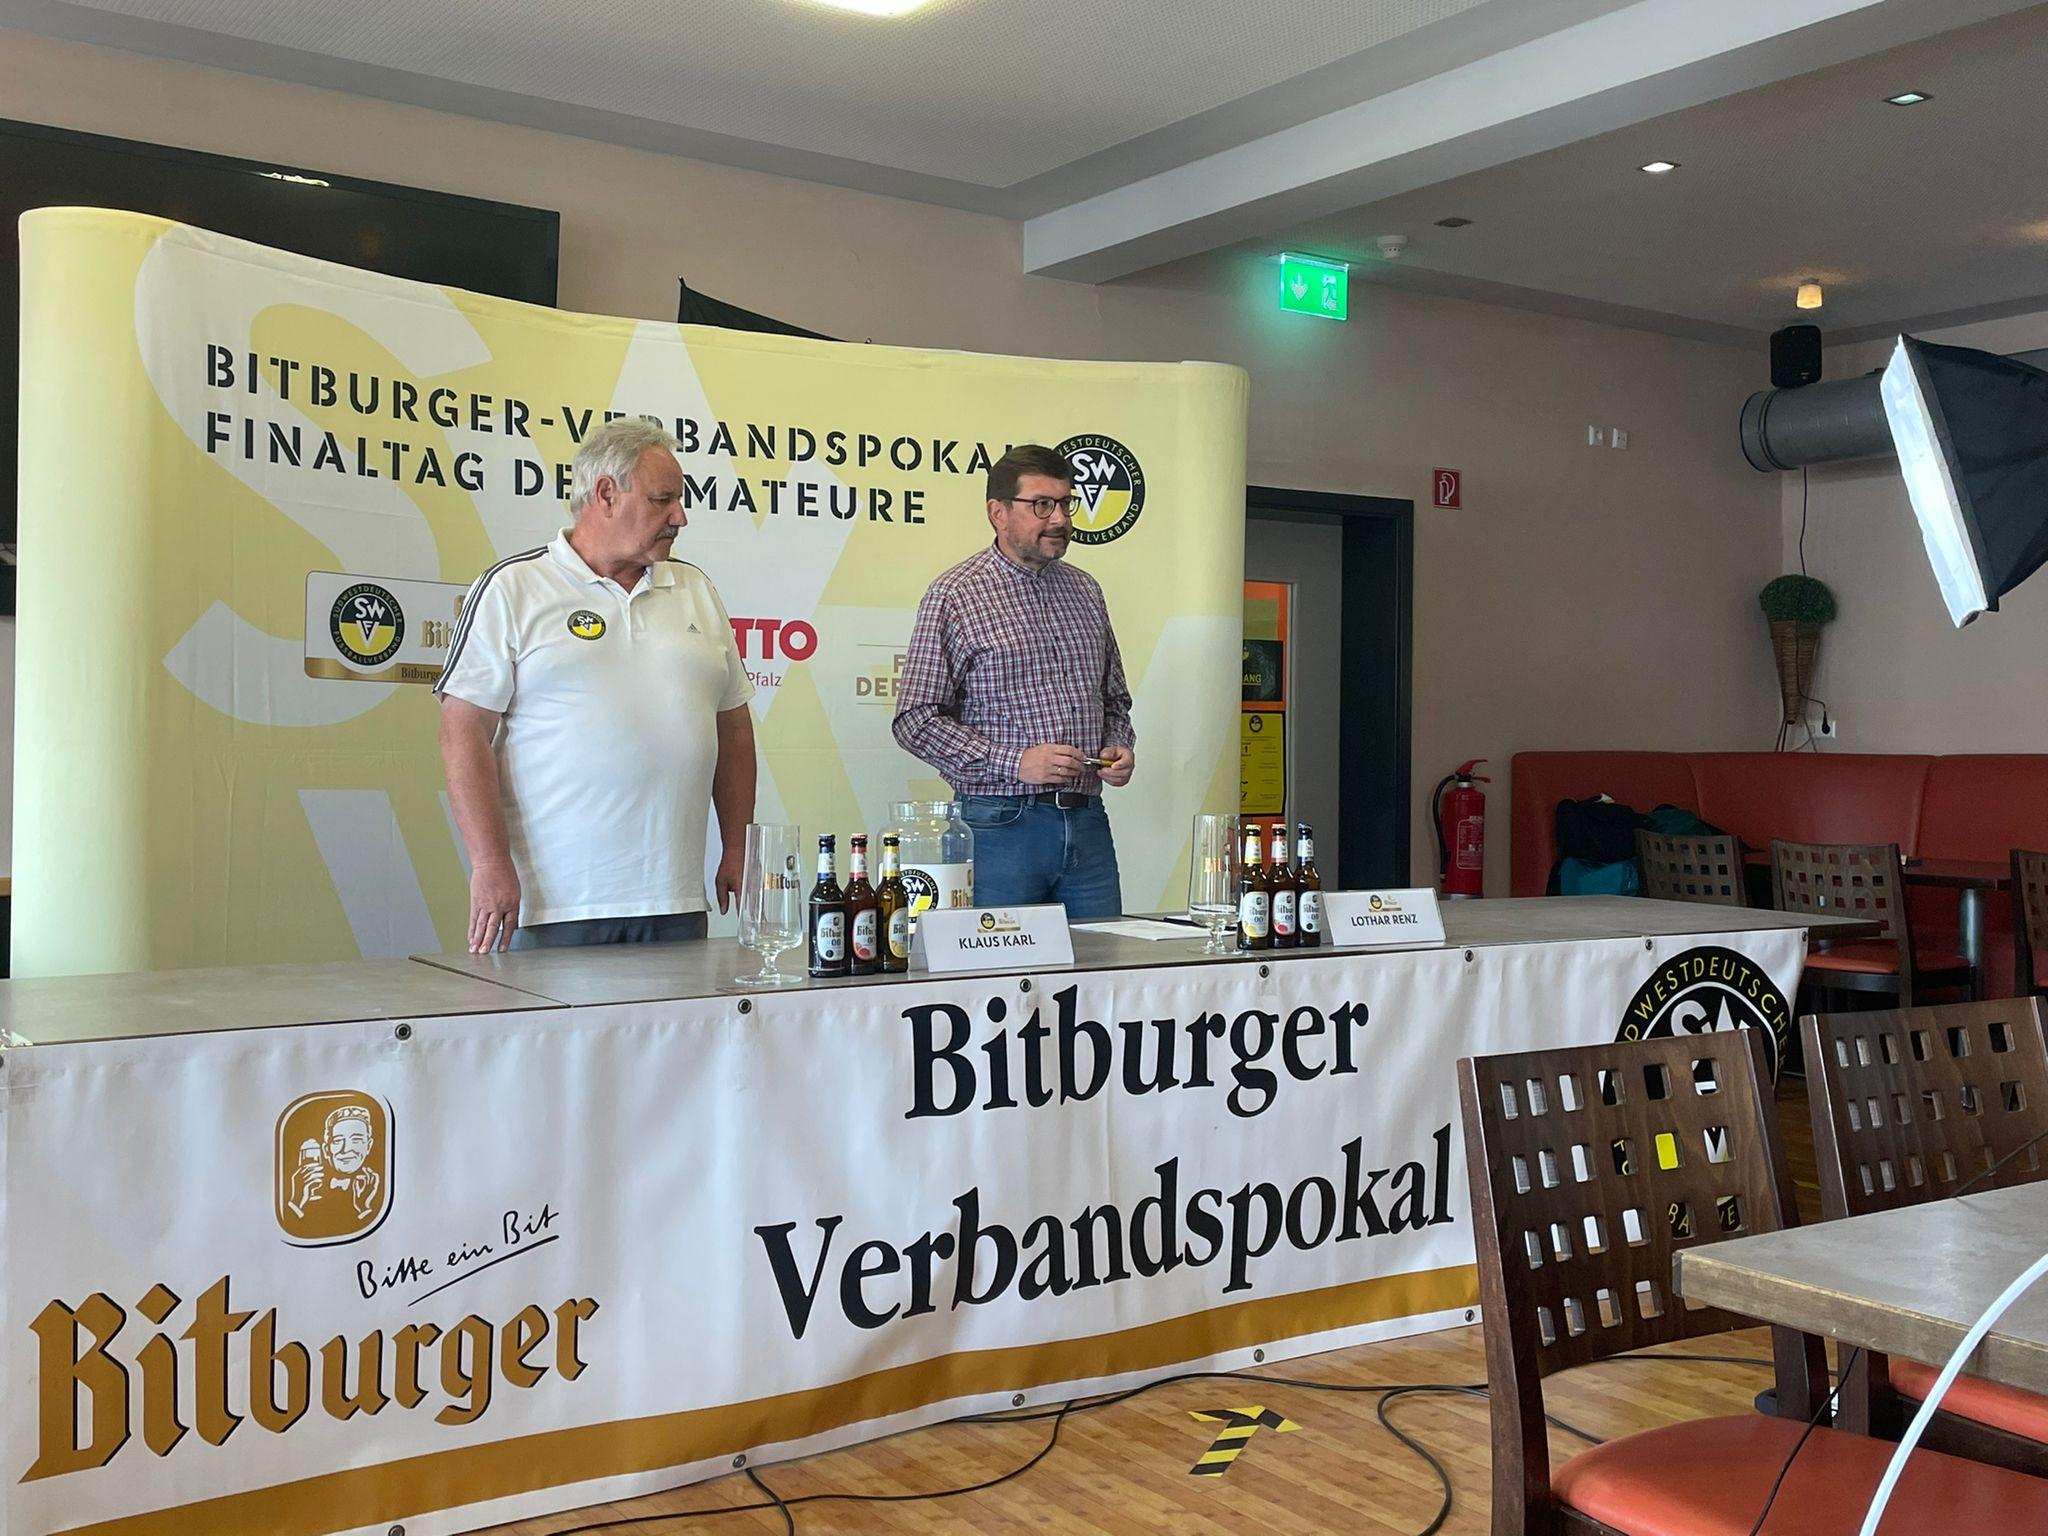 Auslosung im Bitburger Verbandspokal 5. Runde